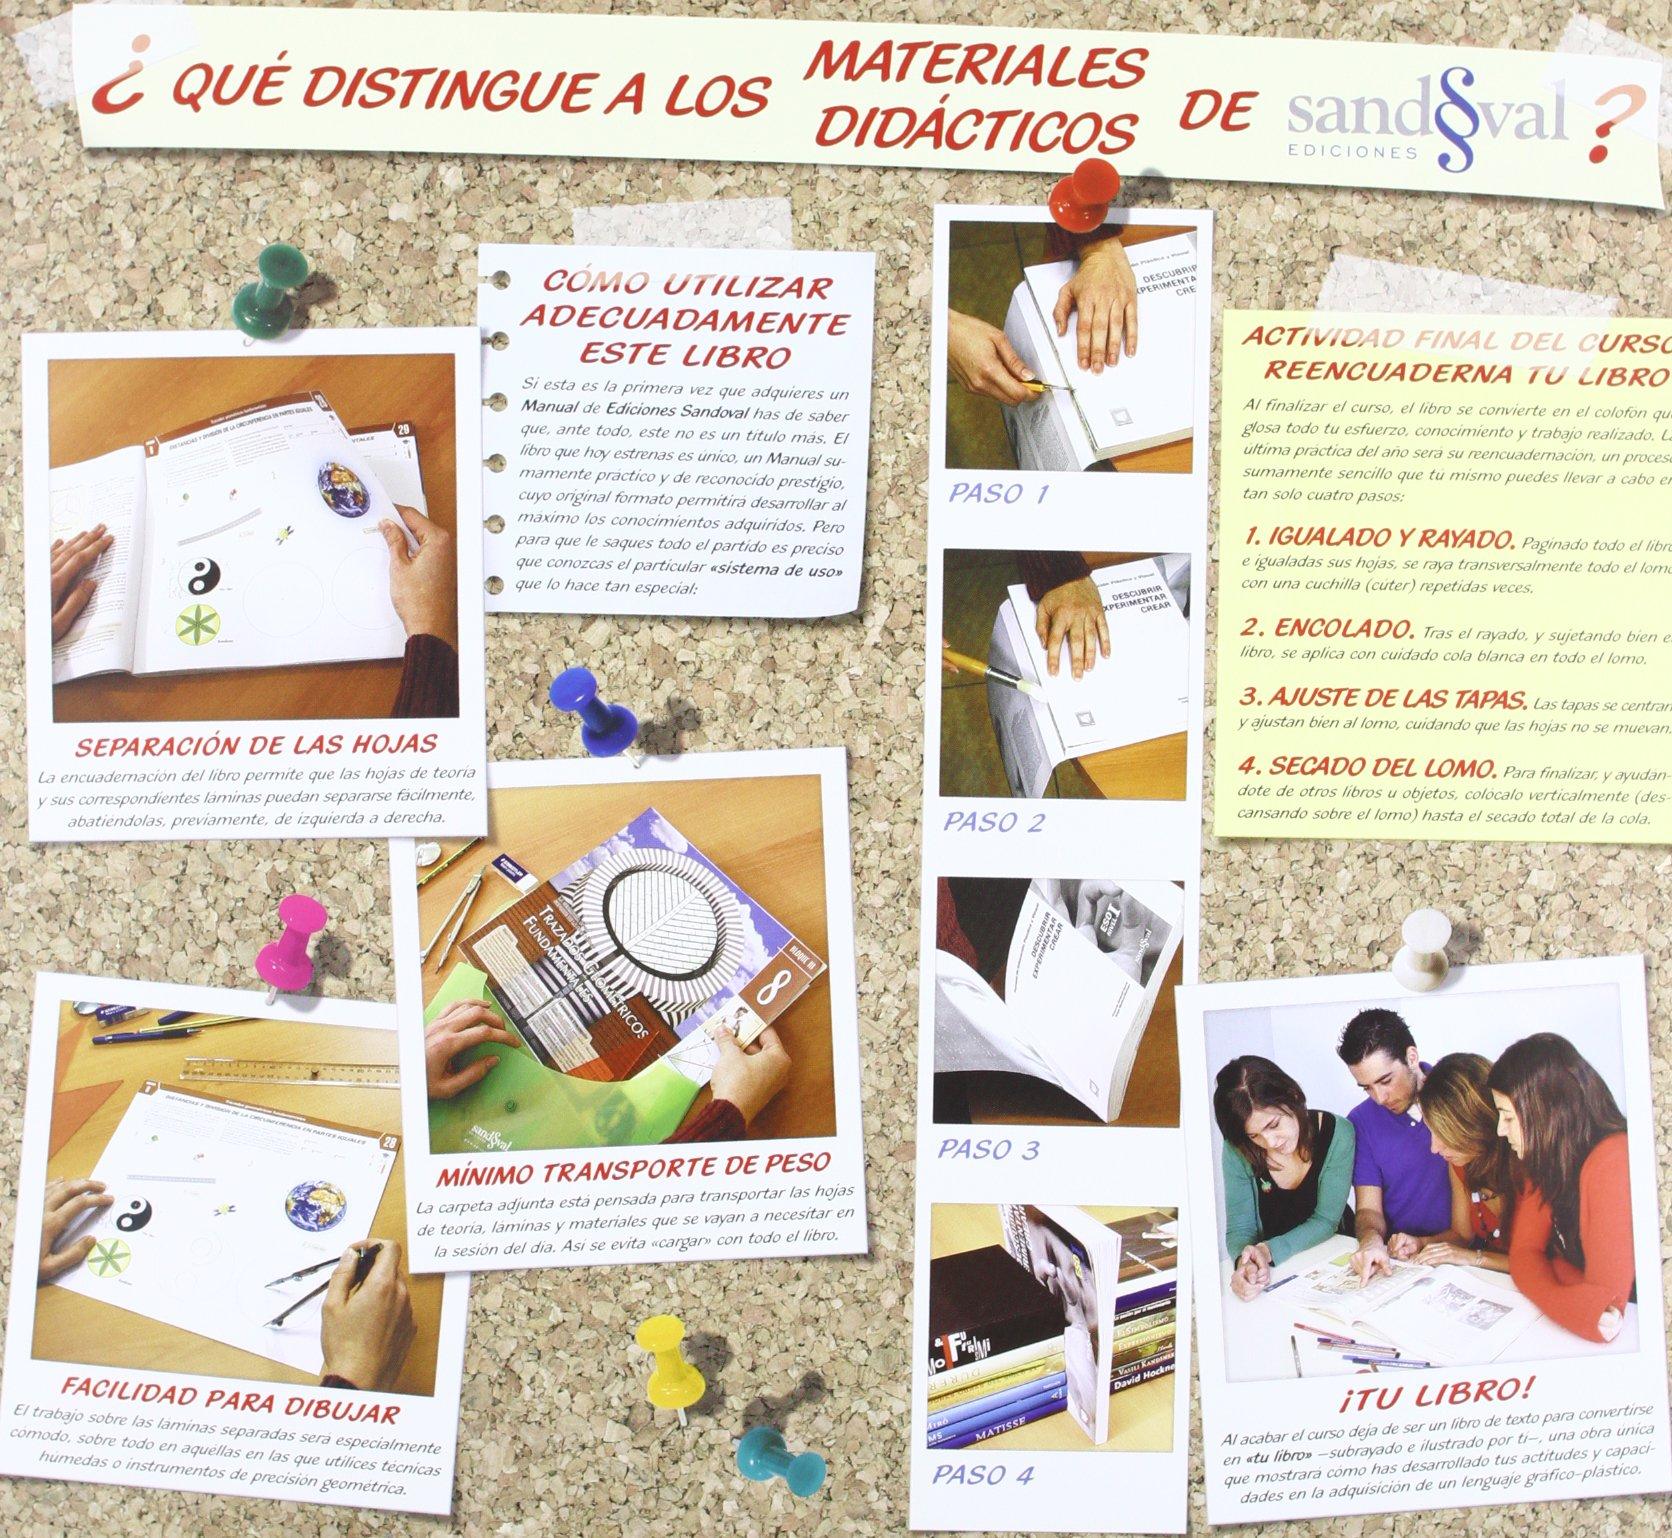 Observar, imaginar, expresar, 4 ESO: A. de Sandoval Guerra: 9788493902506: Amazon.com: Books